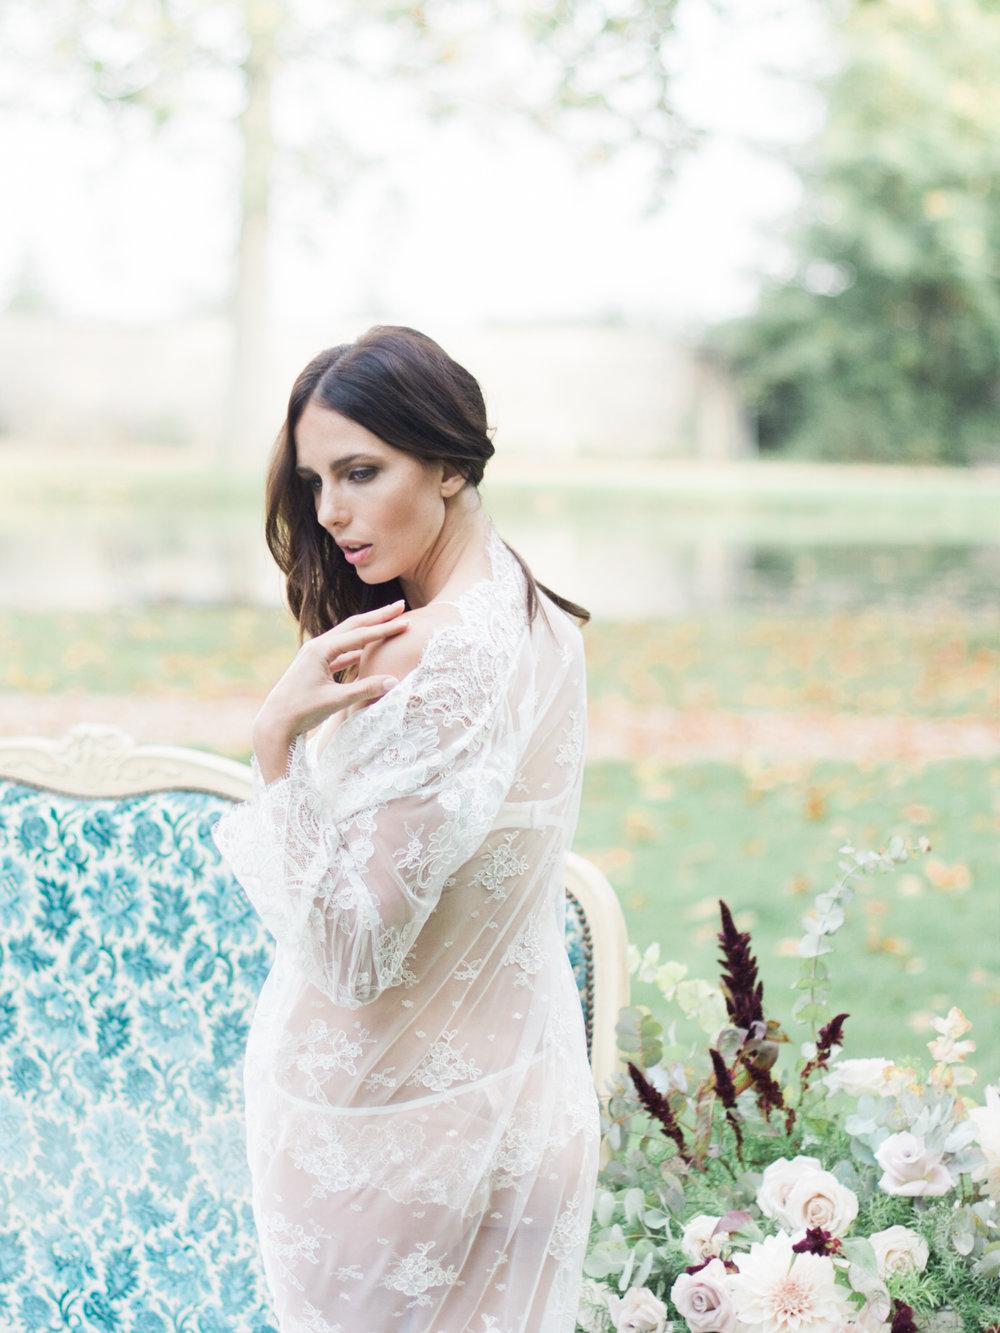 JacquelineAnnePhotography-Boudoir-Outdoors-17.jpg